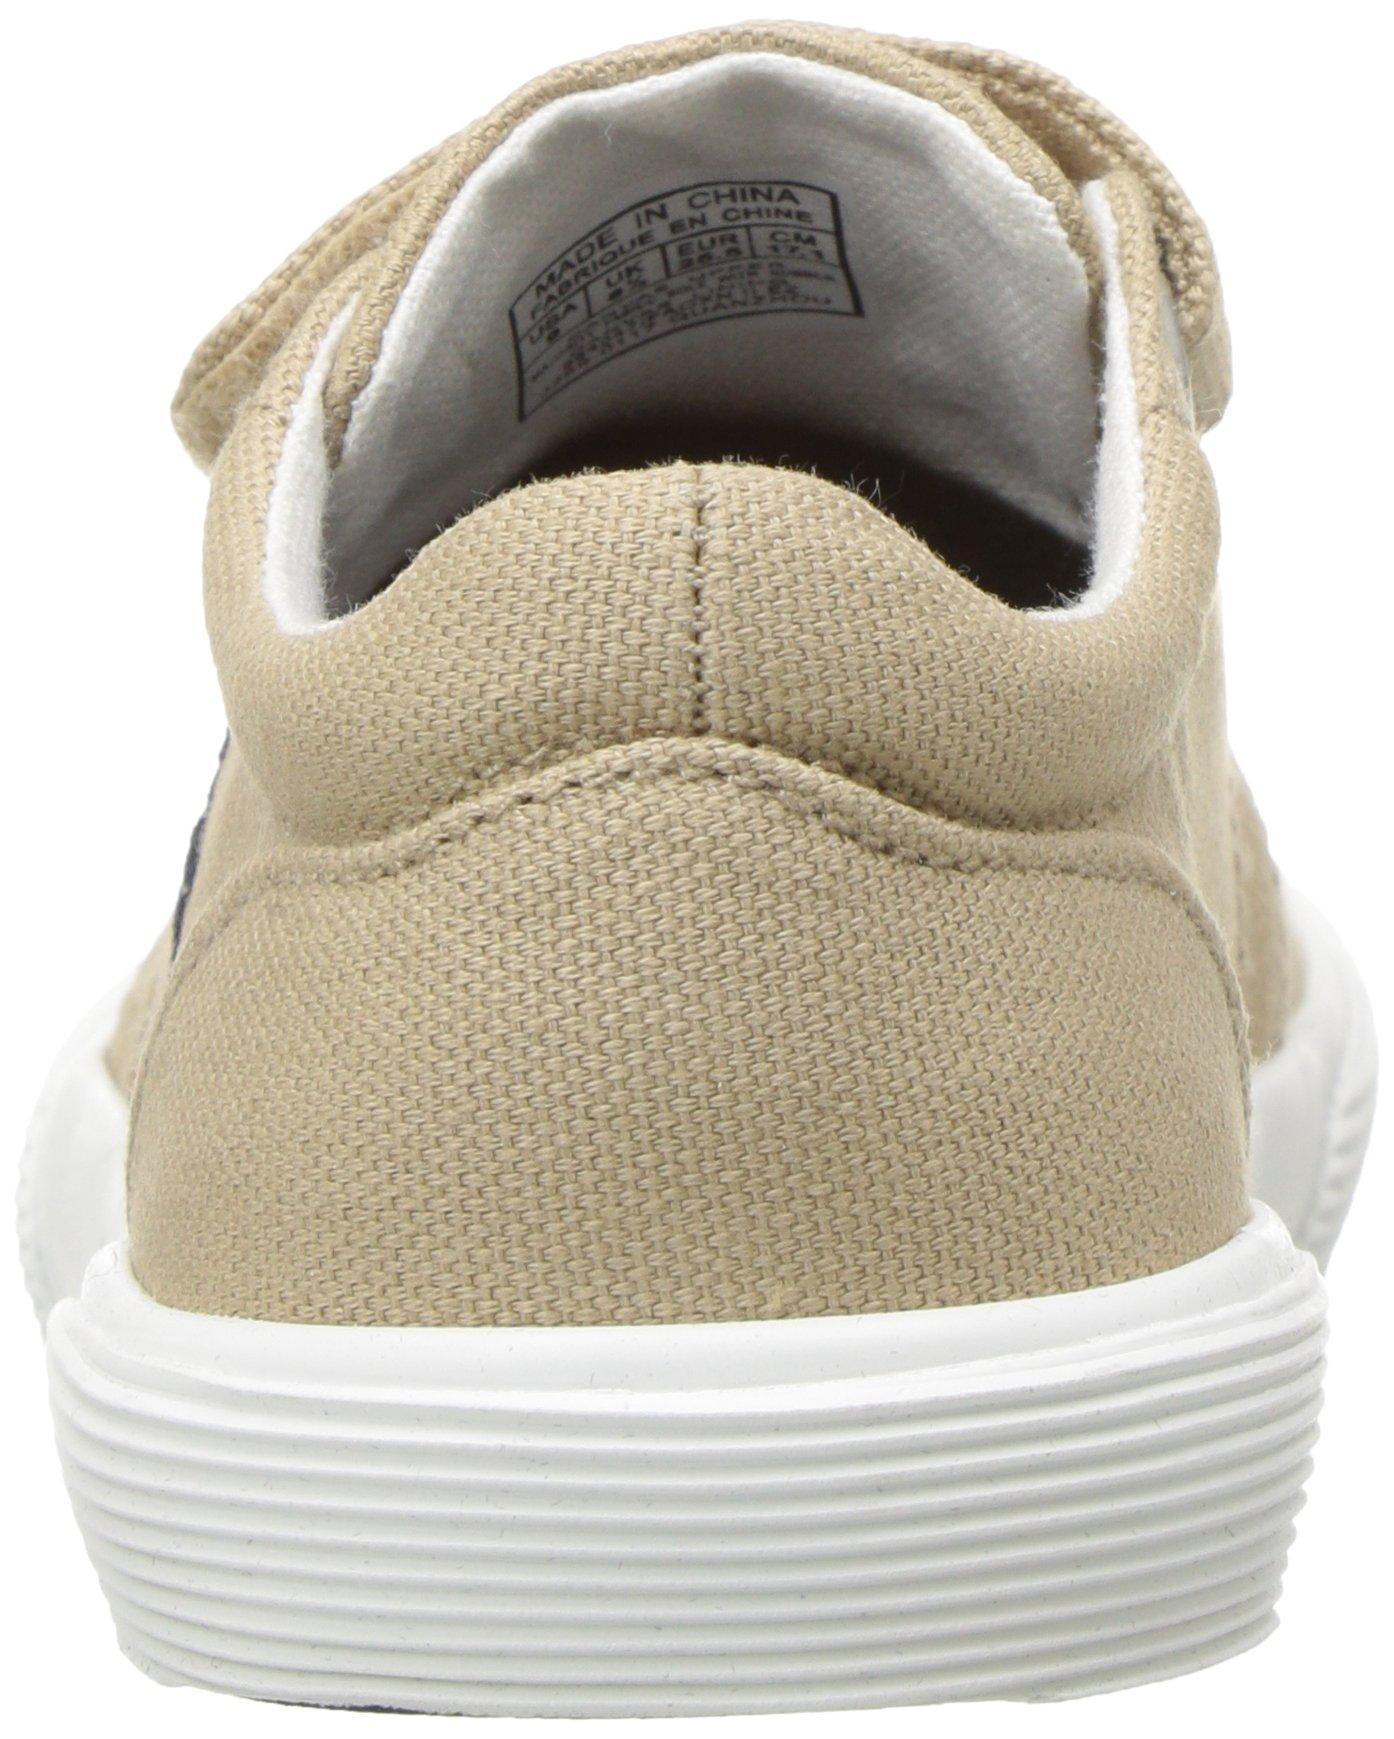 Polo Ralph Lauren Kids Boys' Faxon II Sneaker, Khaki Cotton, 10 M US Toddler by Polo Ralph Lauren (Image #2)